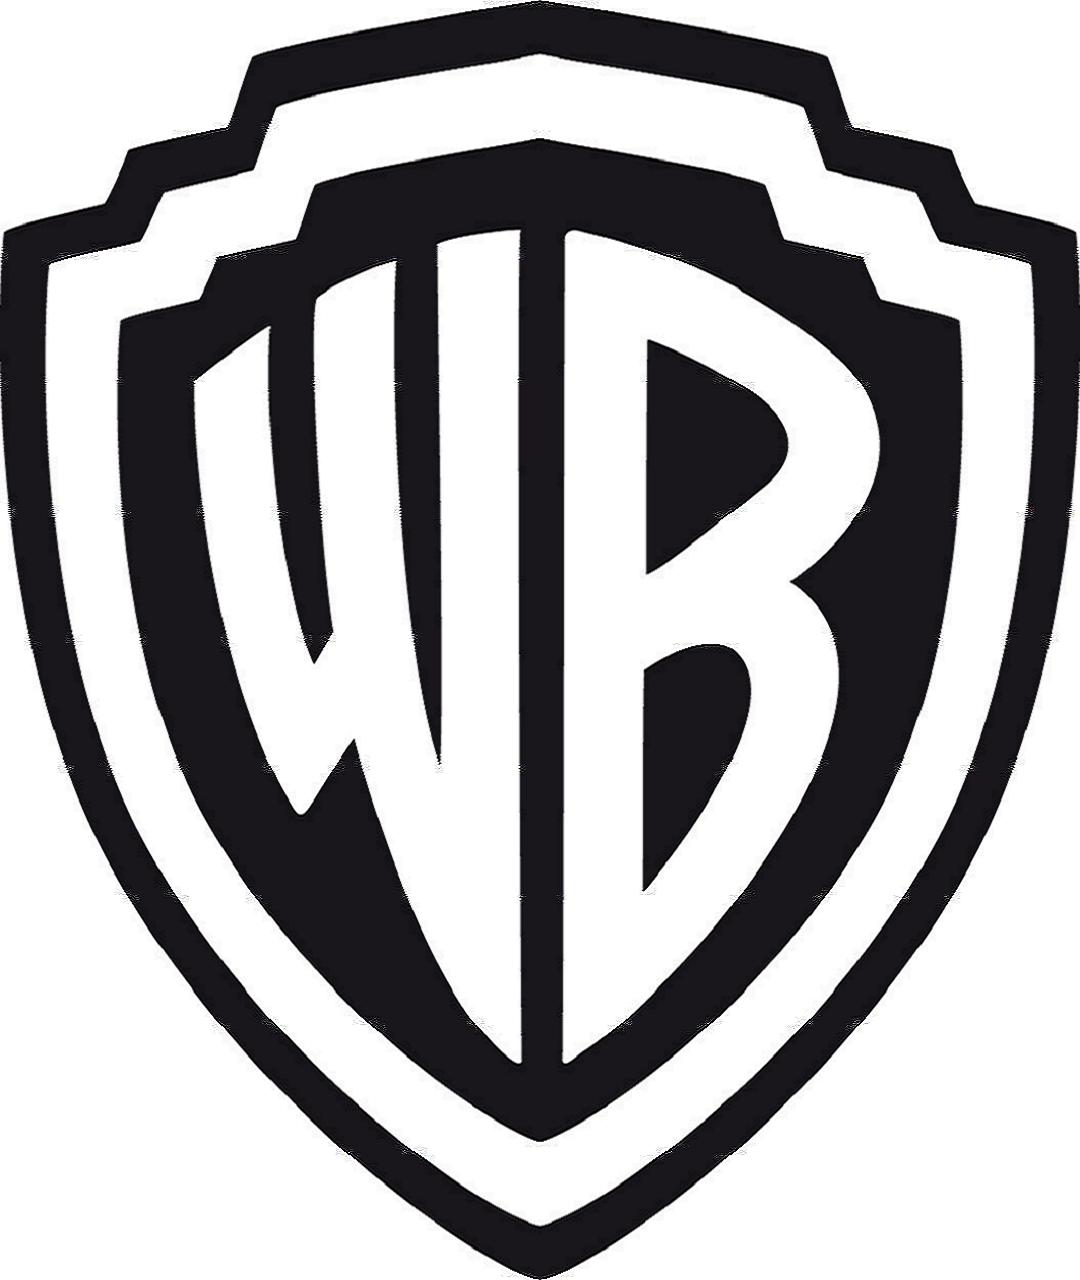 Warner Bros Logo PNG - 32407